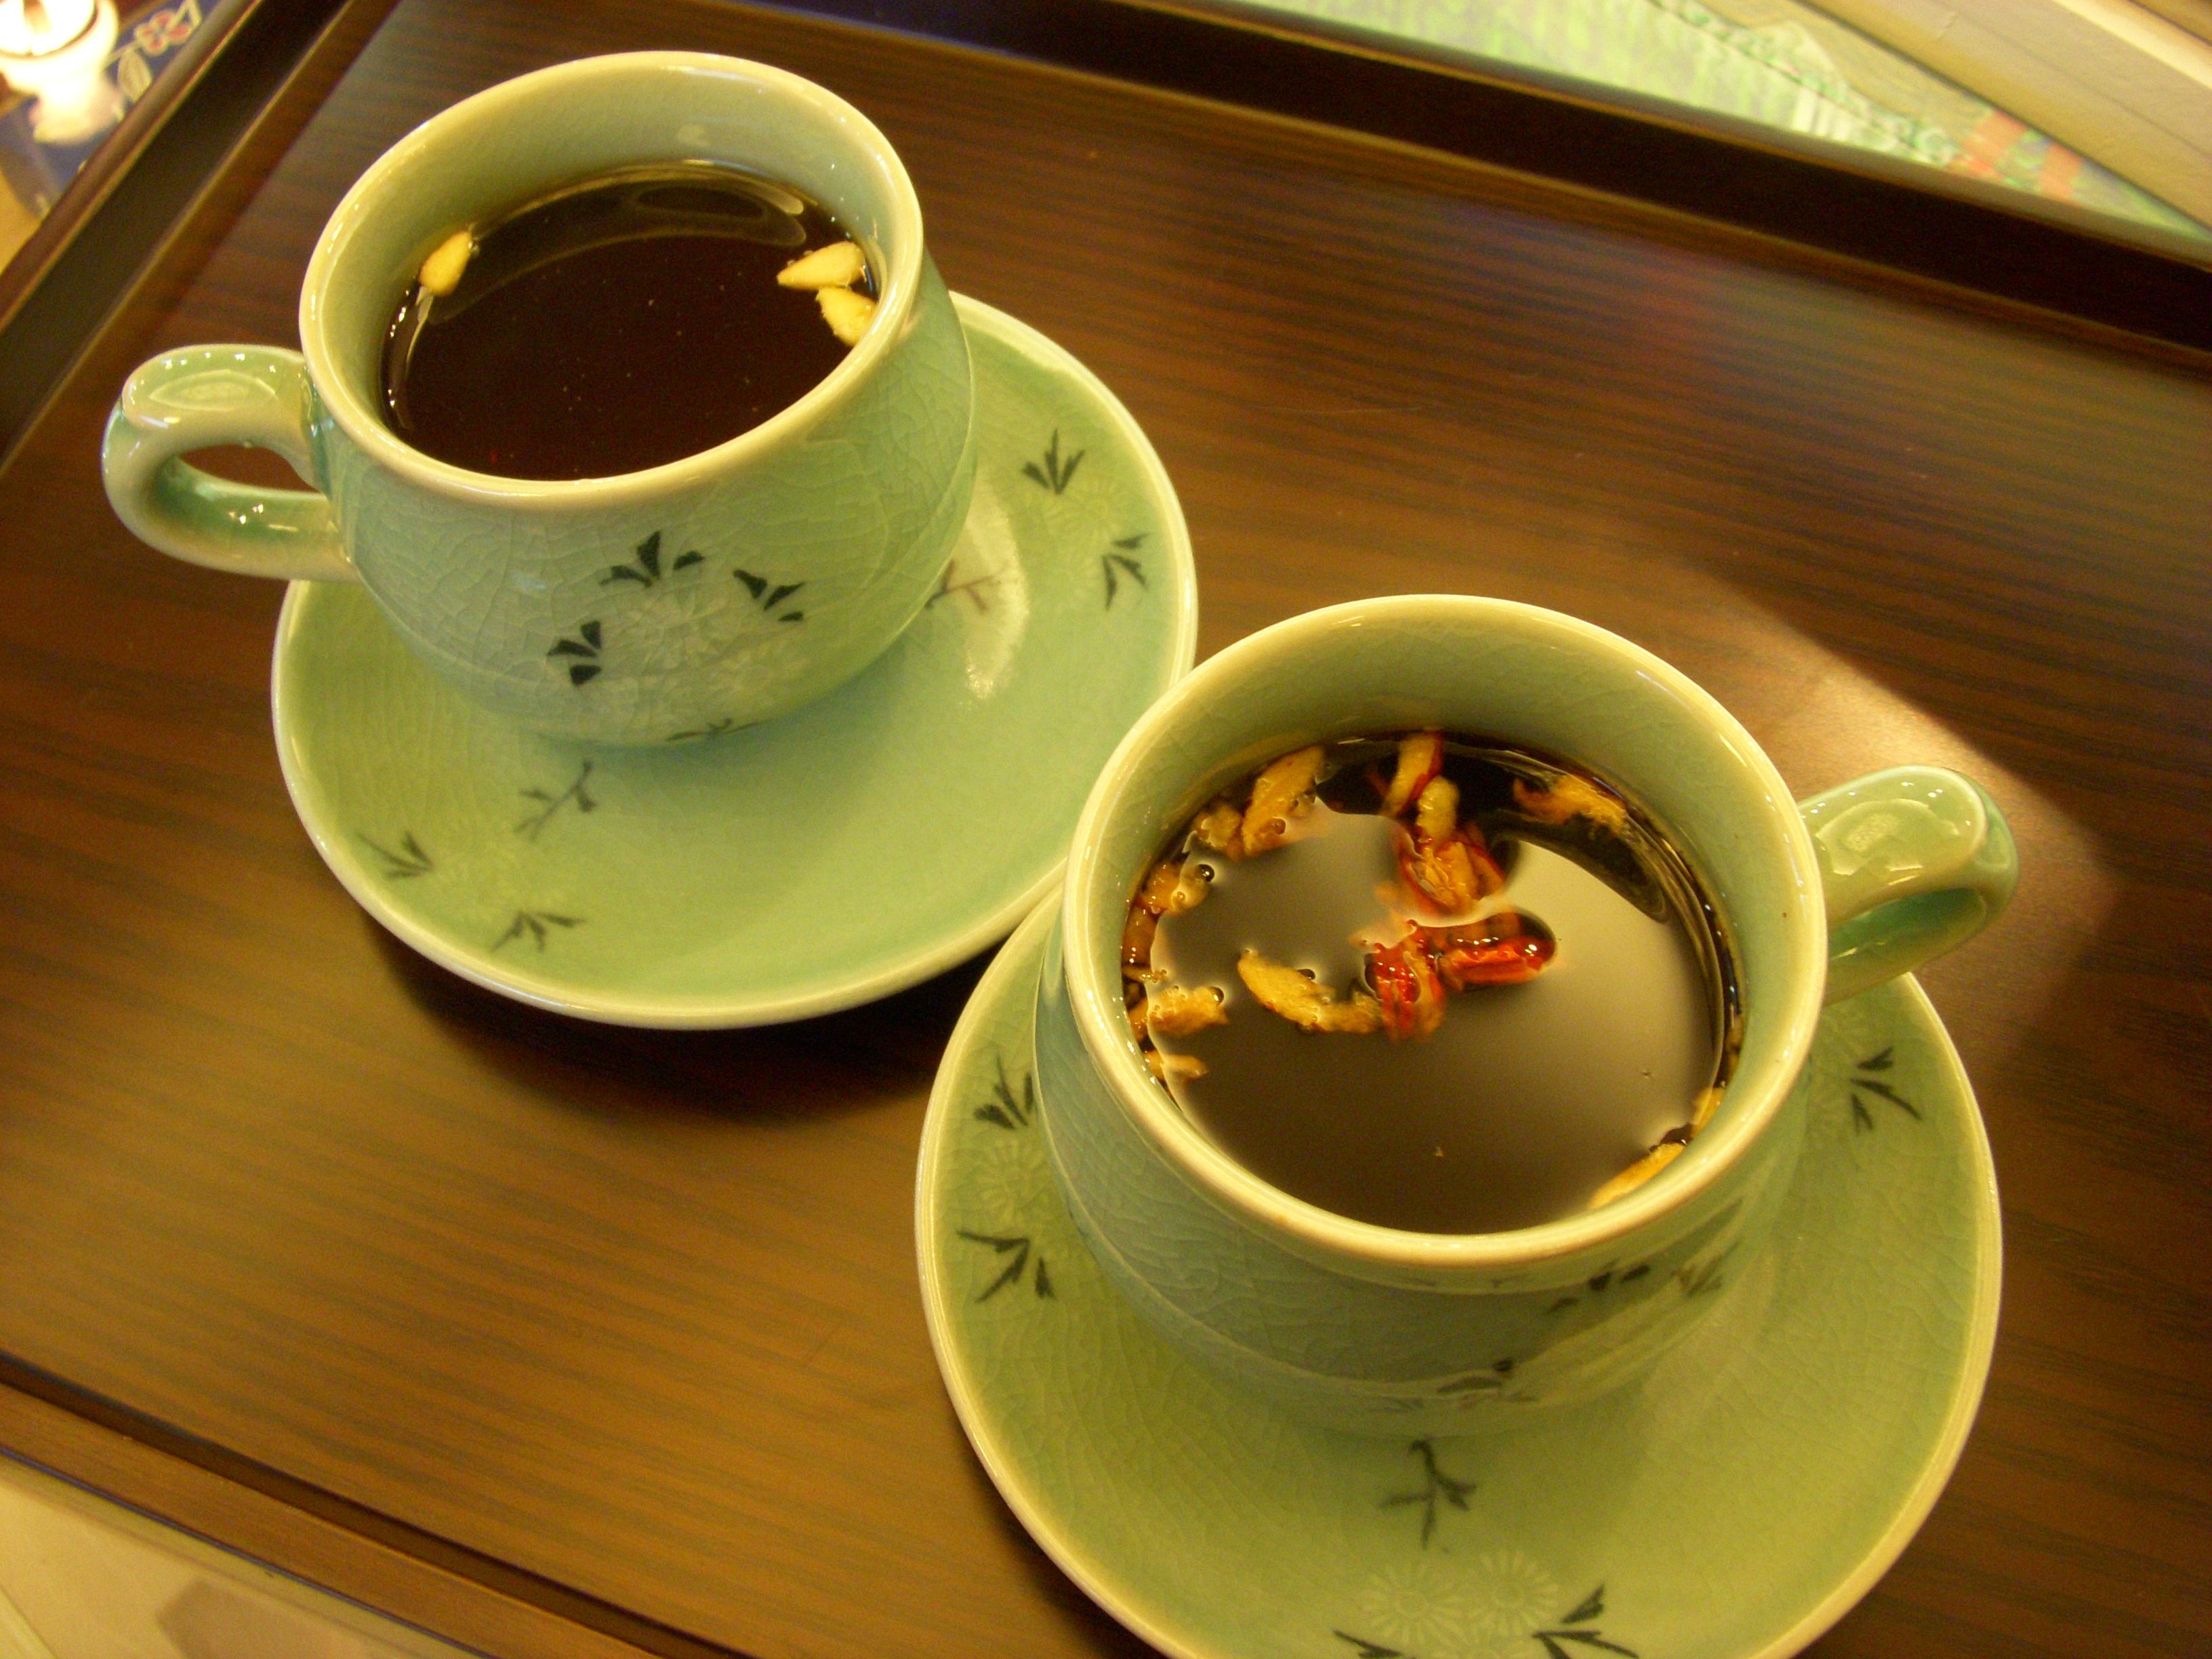 File saenggang cha korean tea jpg wikimedia commons - Nonalcoholic Beverages Main Article Korean Tea